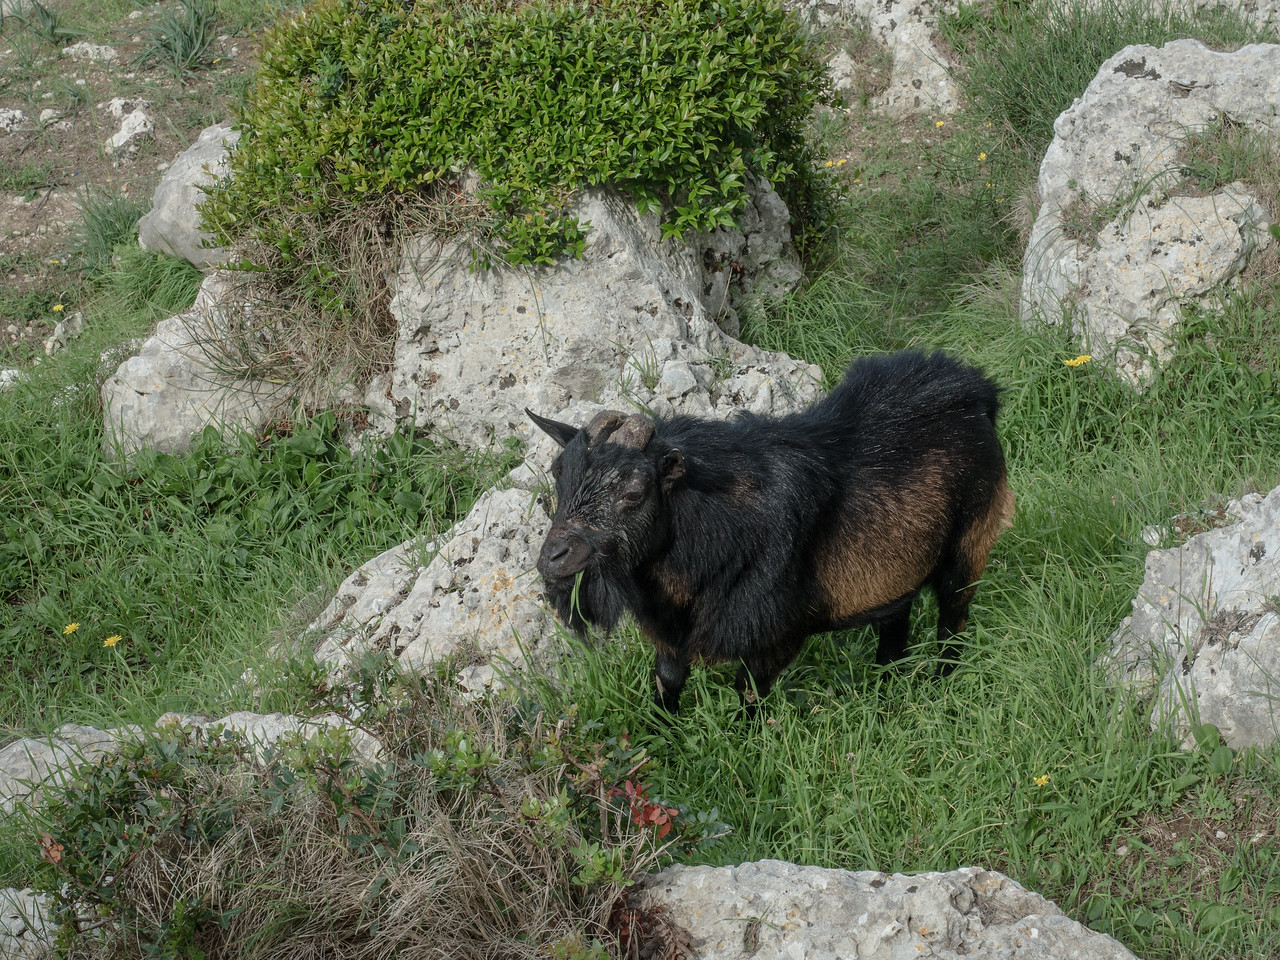 Goat on Villa Jovis path, Capri